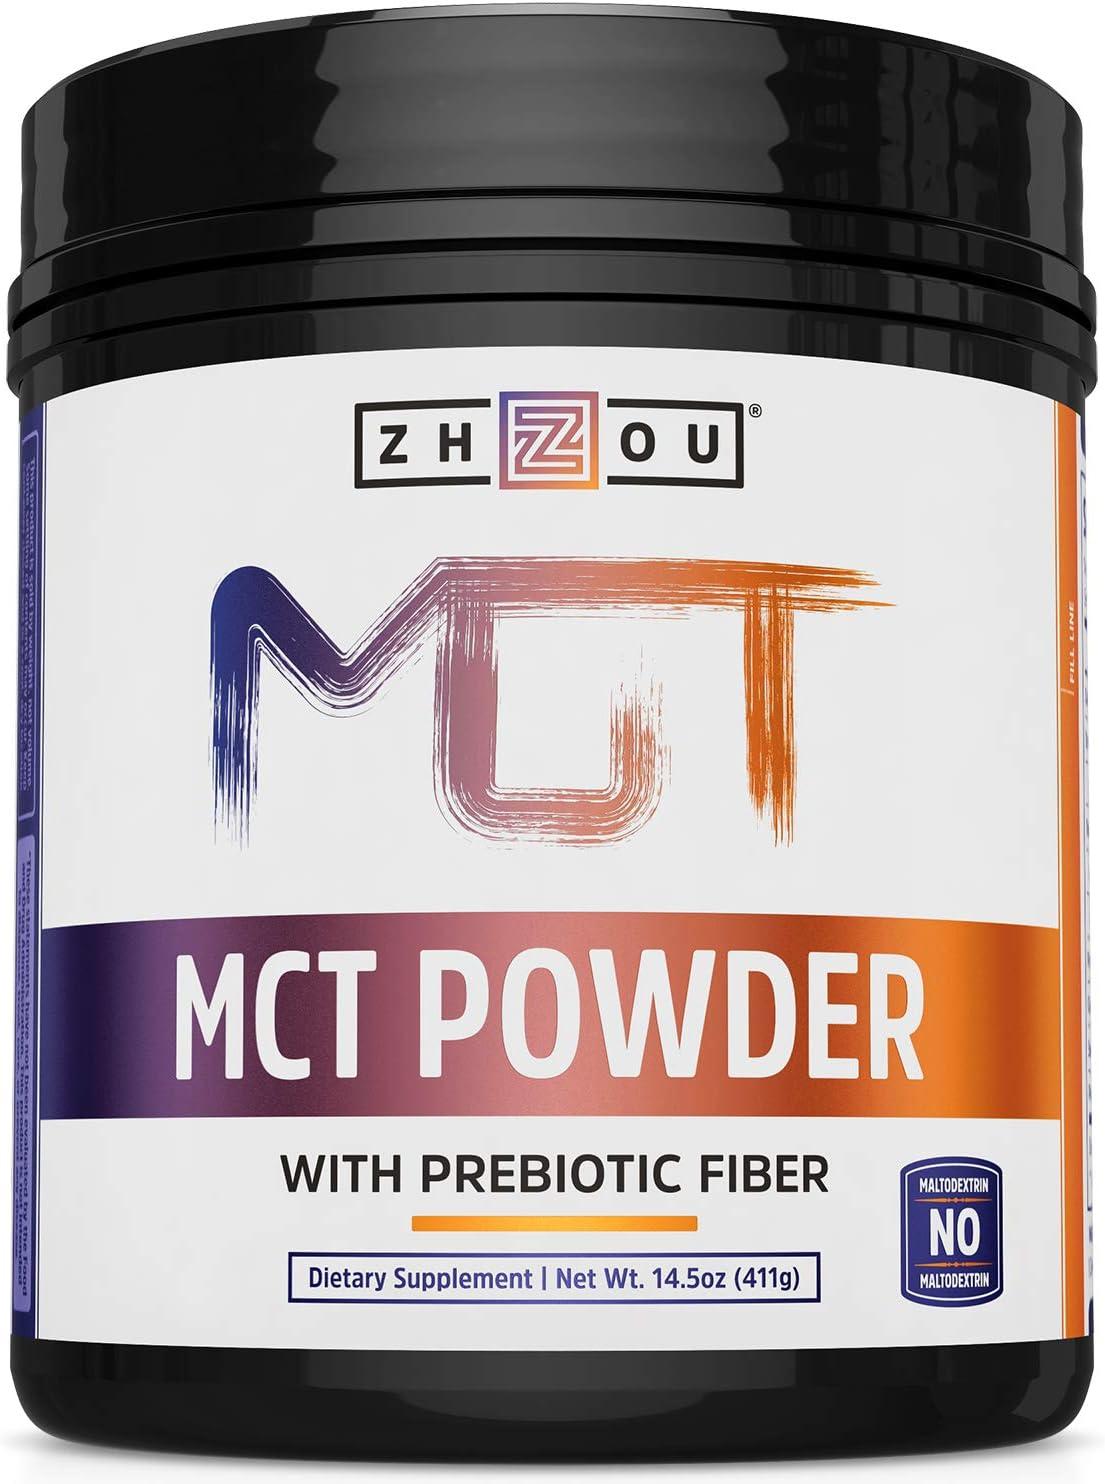 Zhou Nutrition MCT Powder with Prebiotic Fiber